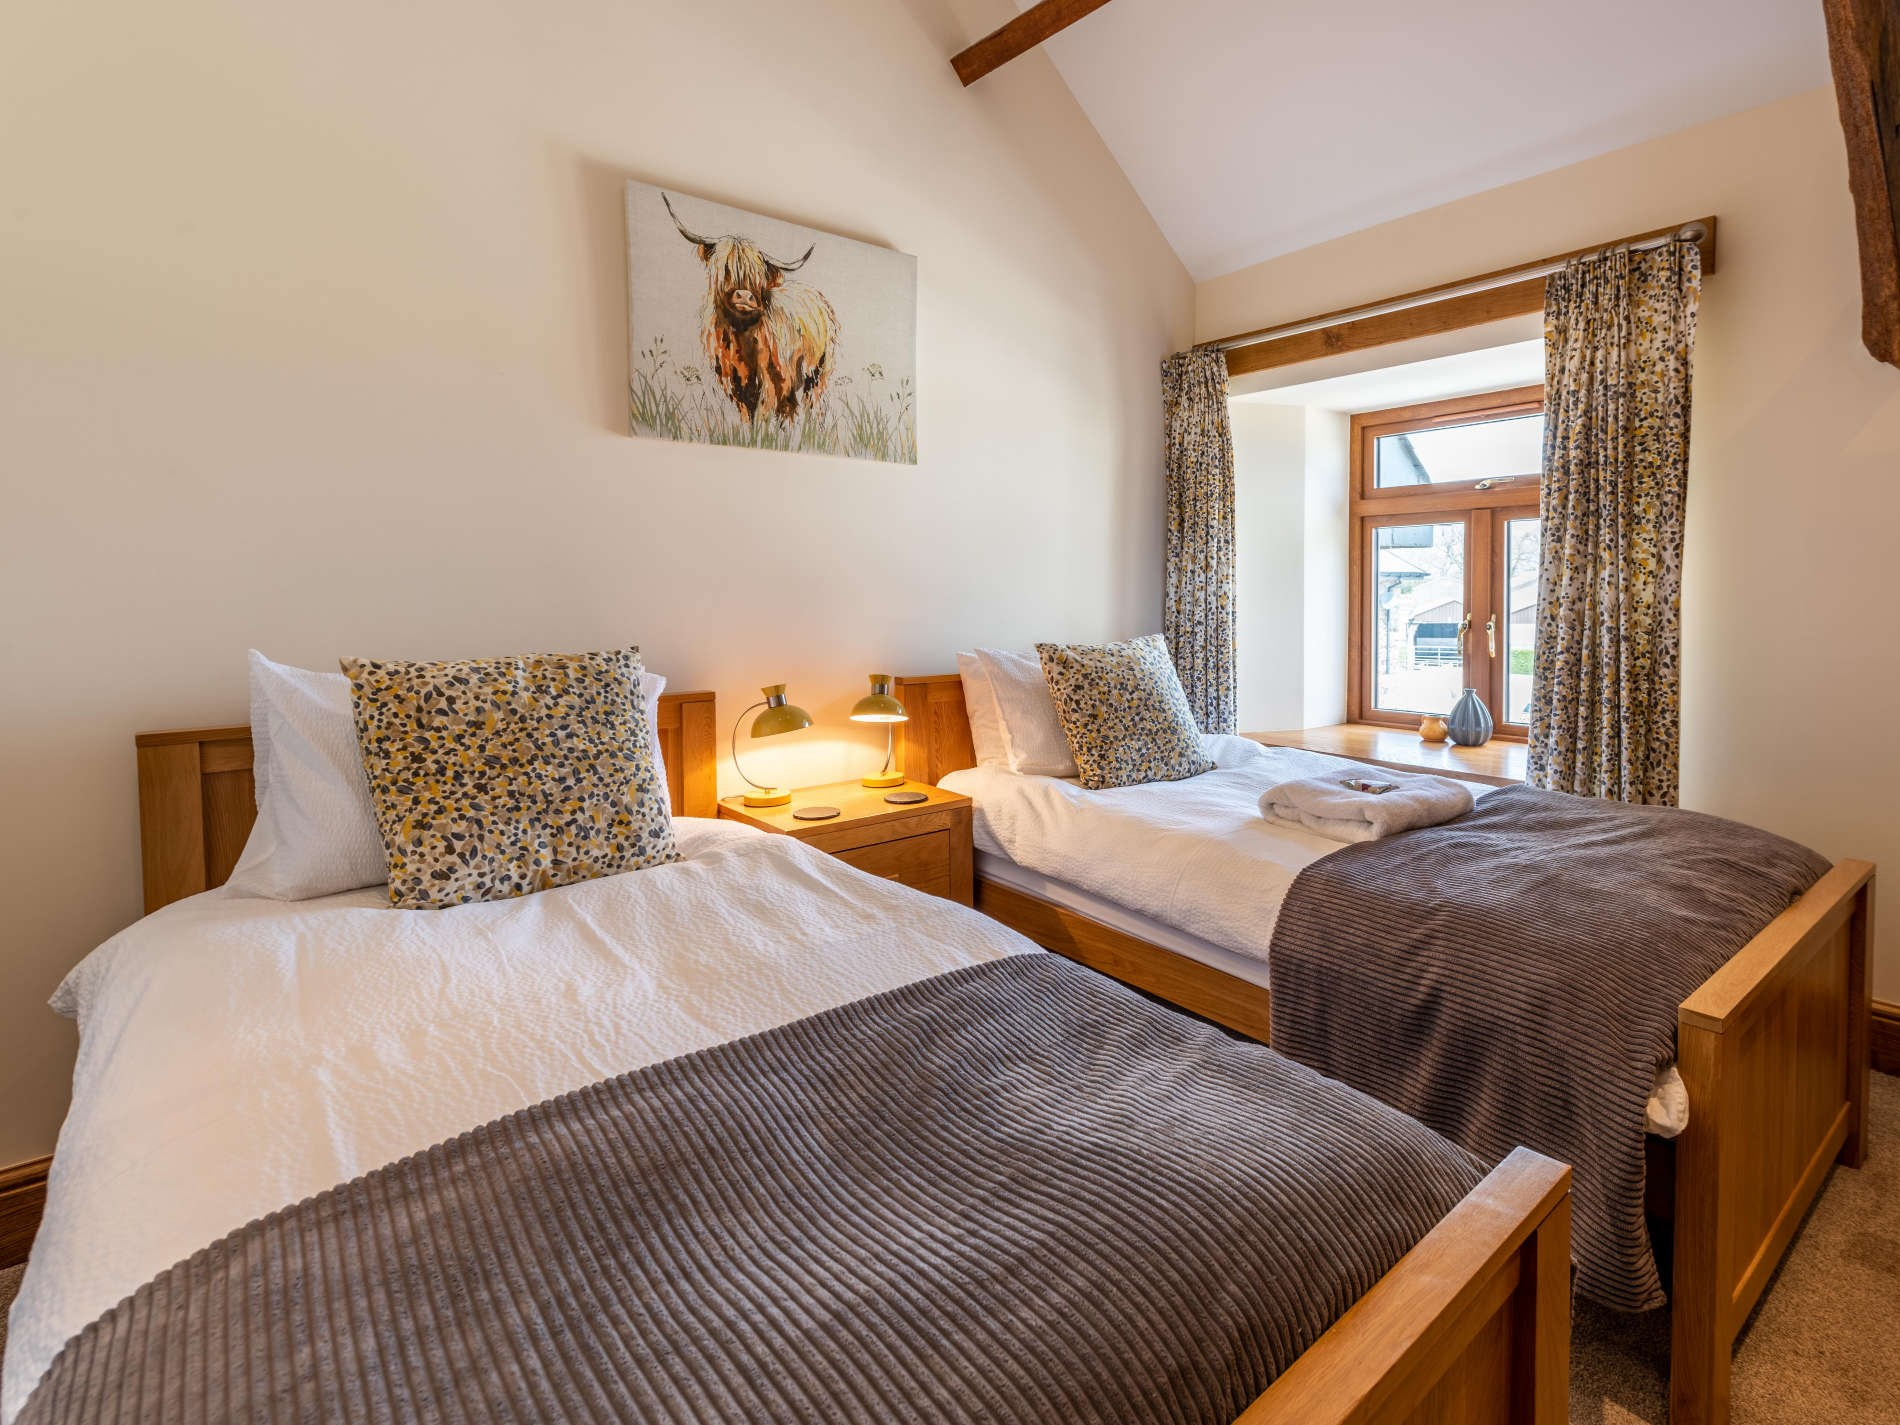 3 Bedroom Barn in Mid and East Devon, Devon